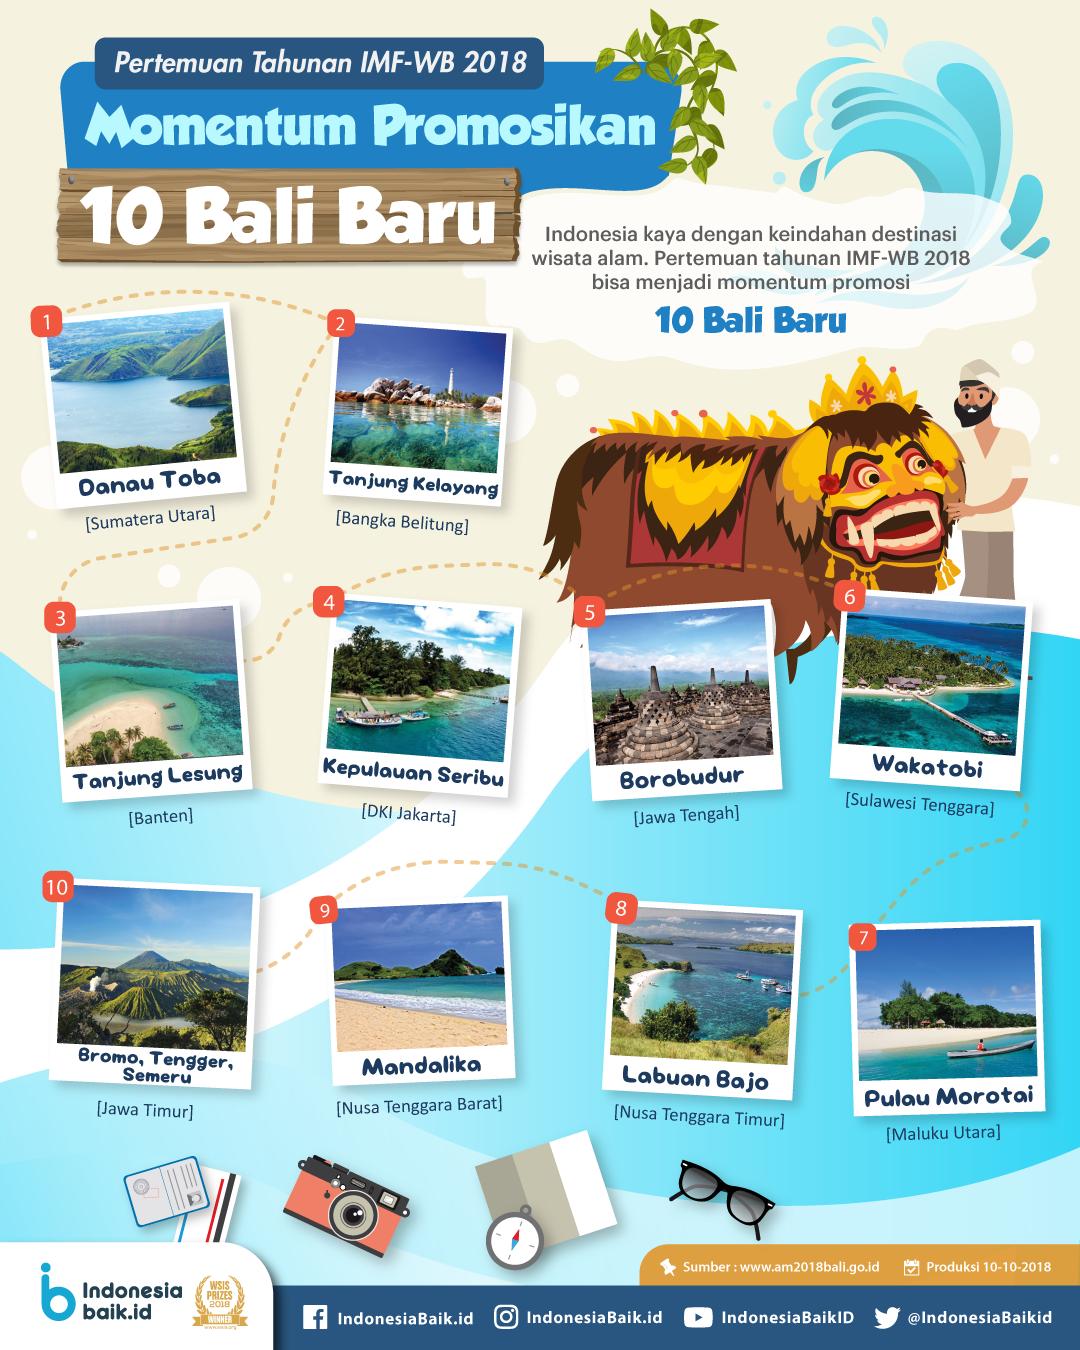 Momentum Promosikan 10 Bali Baru